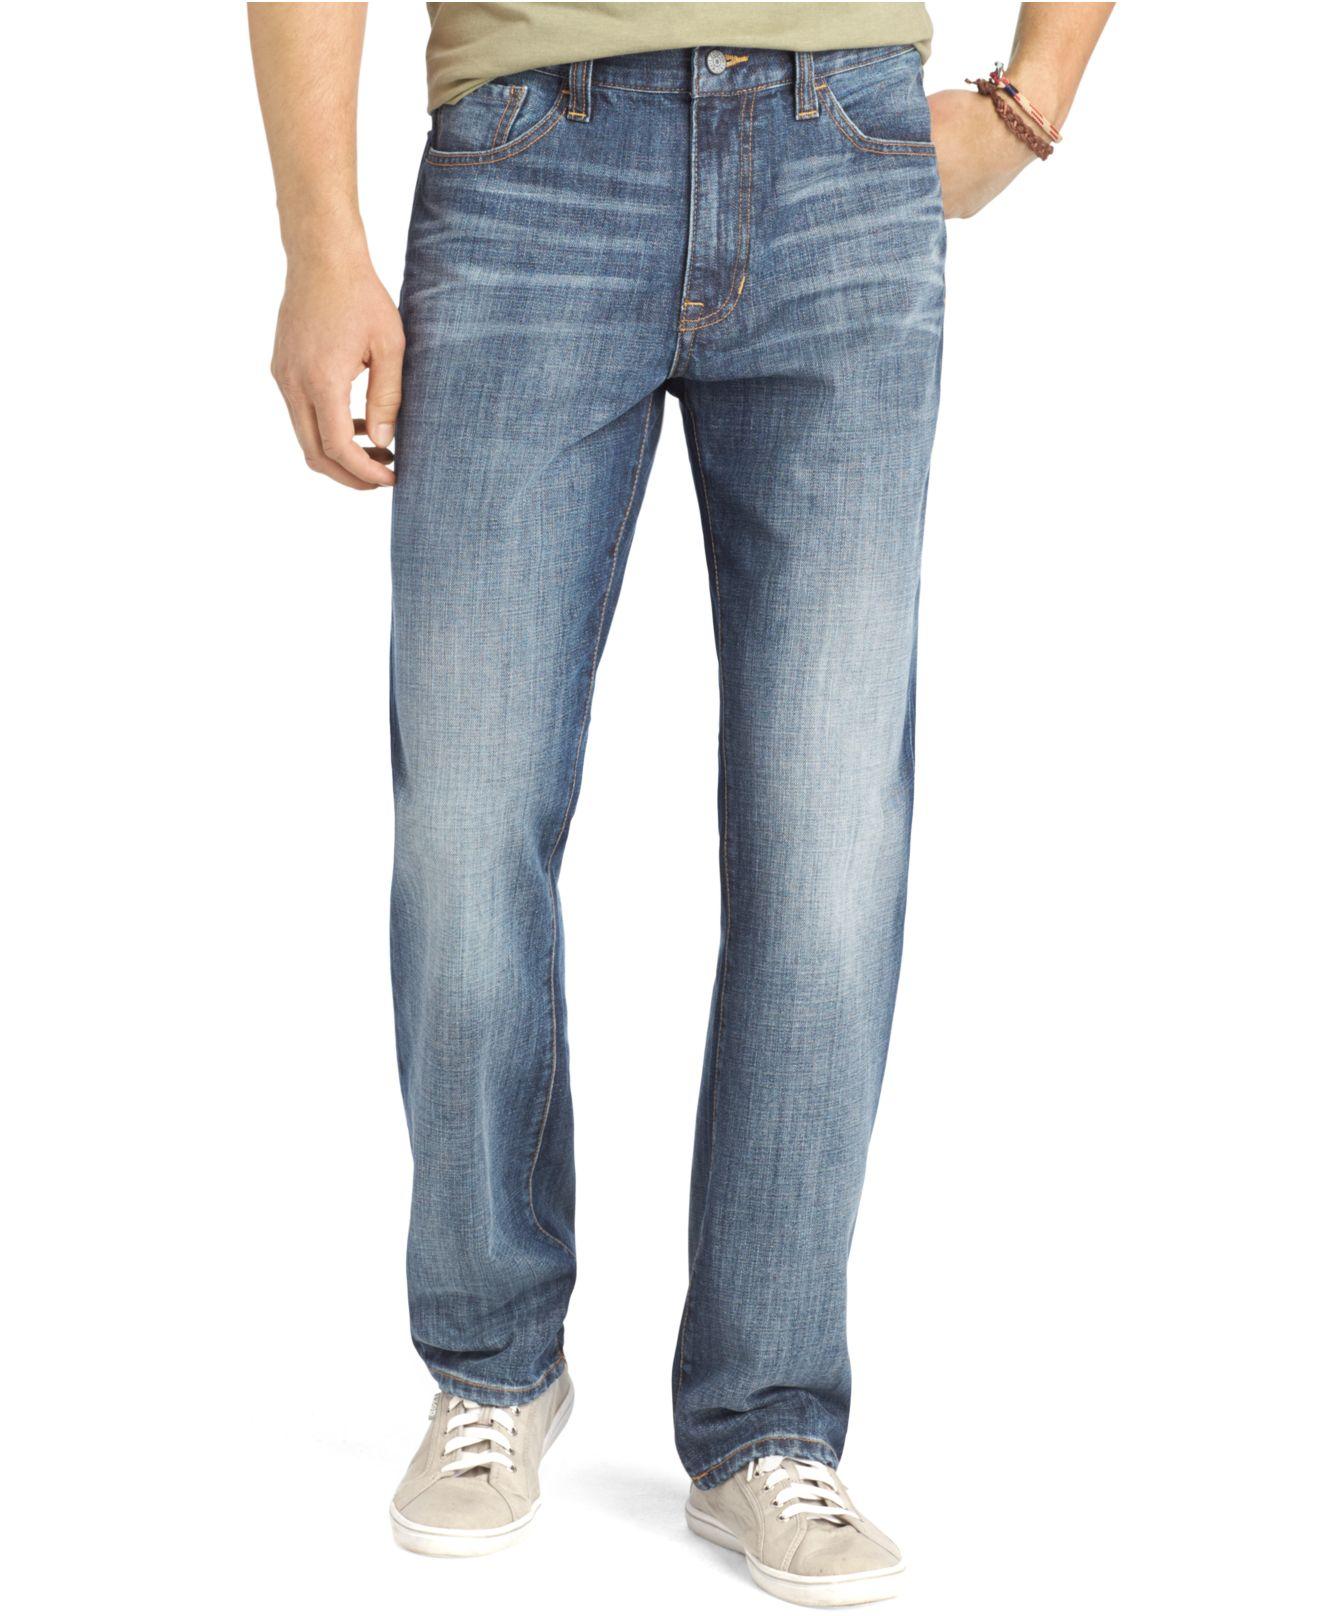 izod relaxed fit jeans in blue for men patriot blue lyst. Black Bedroom Furniture Sets. Home Design Ideas